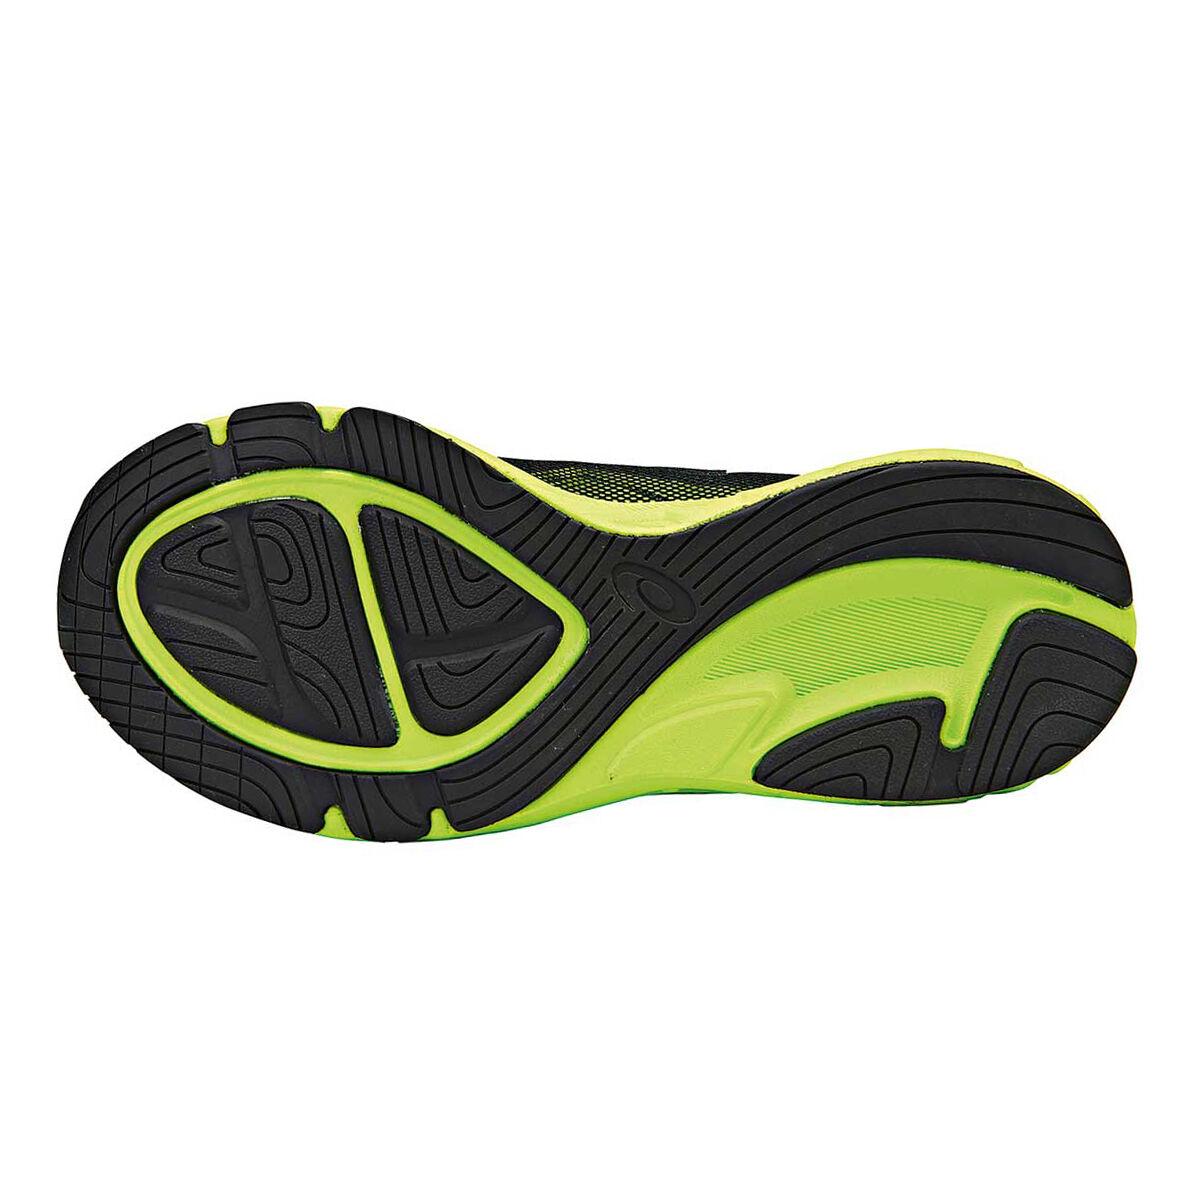 Chaussures Noir de course Garçon Asics GEL Noosa 16244 pour Garçon Noir/ Jaune US 6   3b98c04 - myptmaciasbook.club